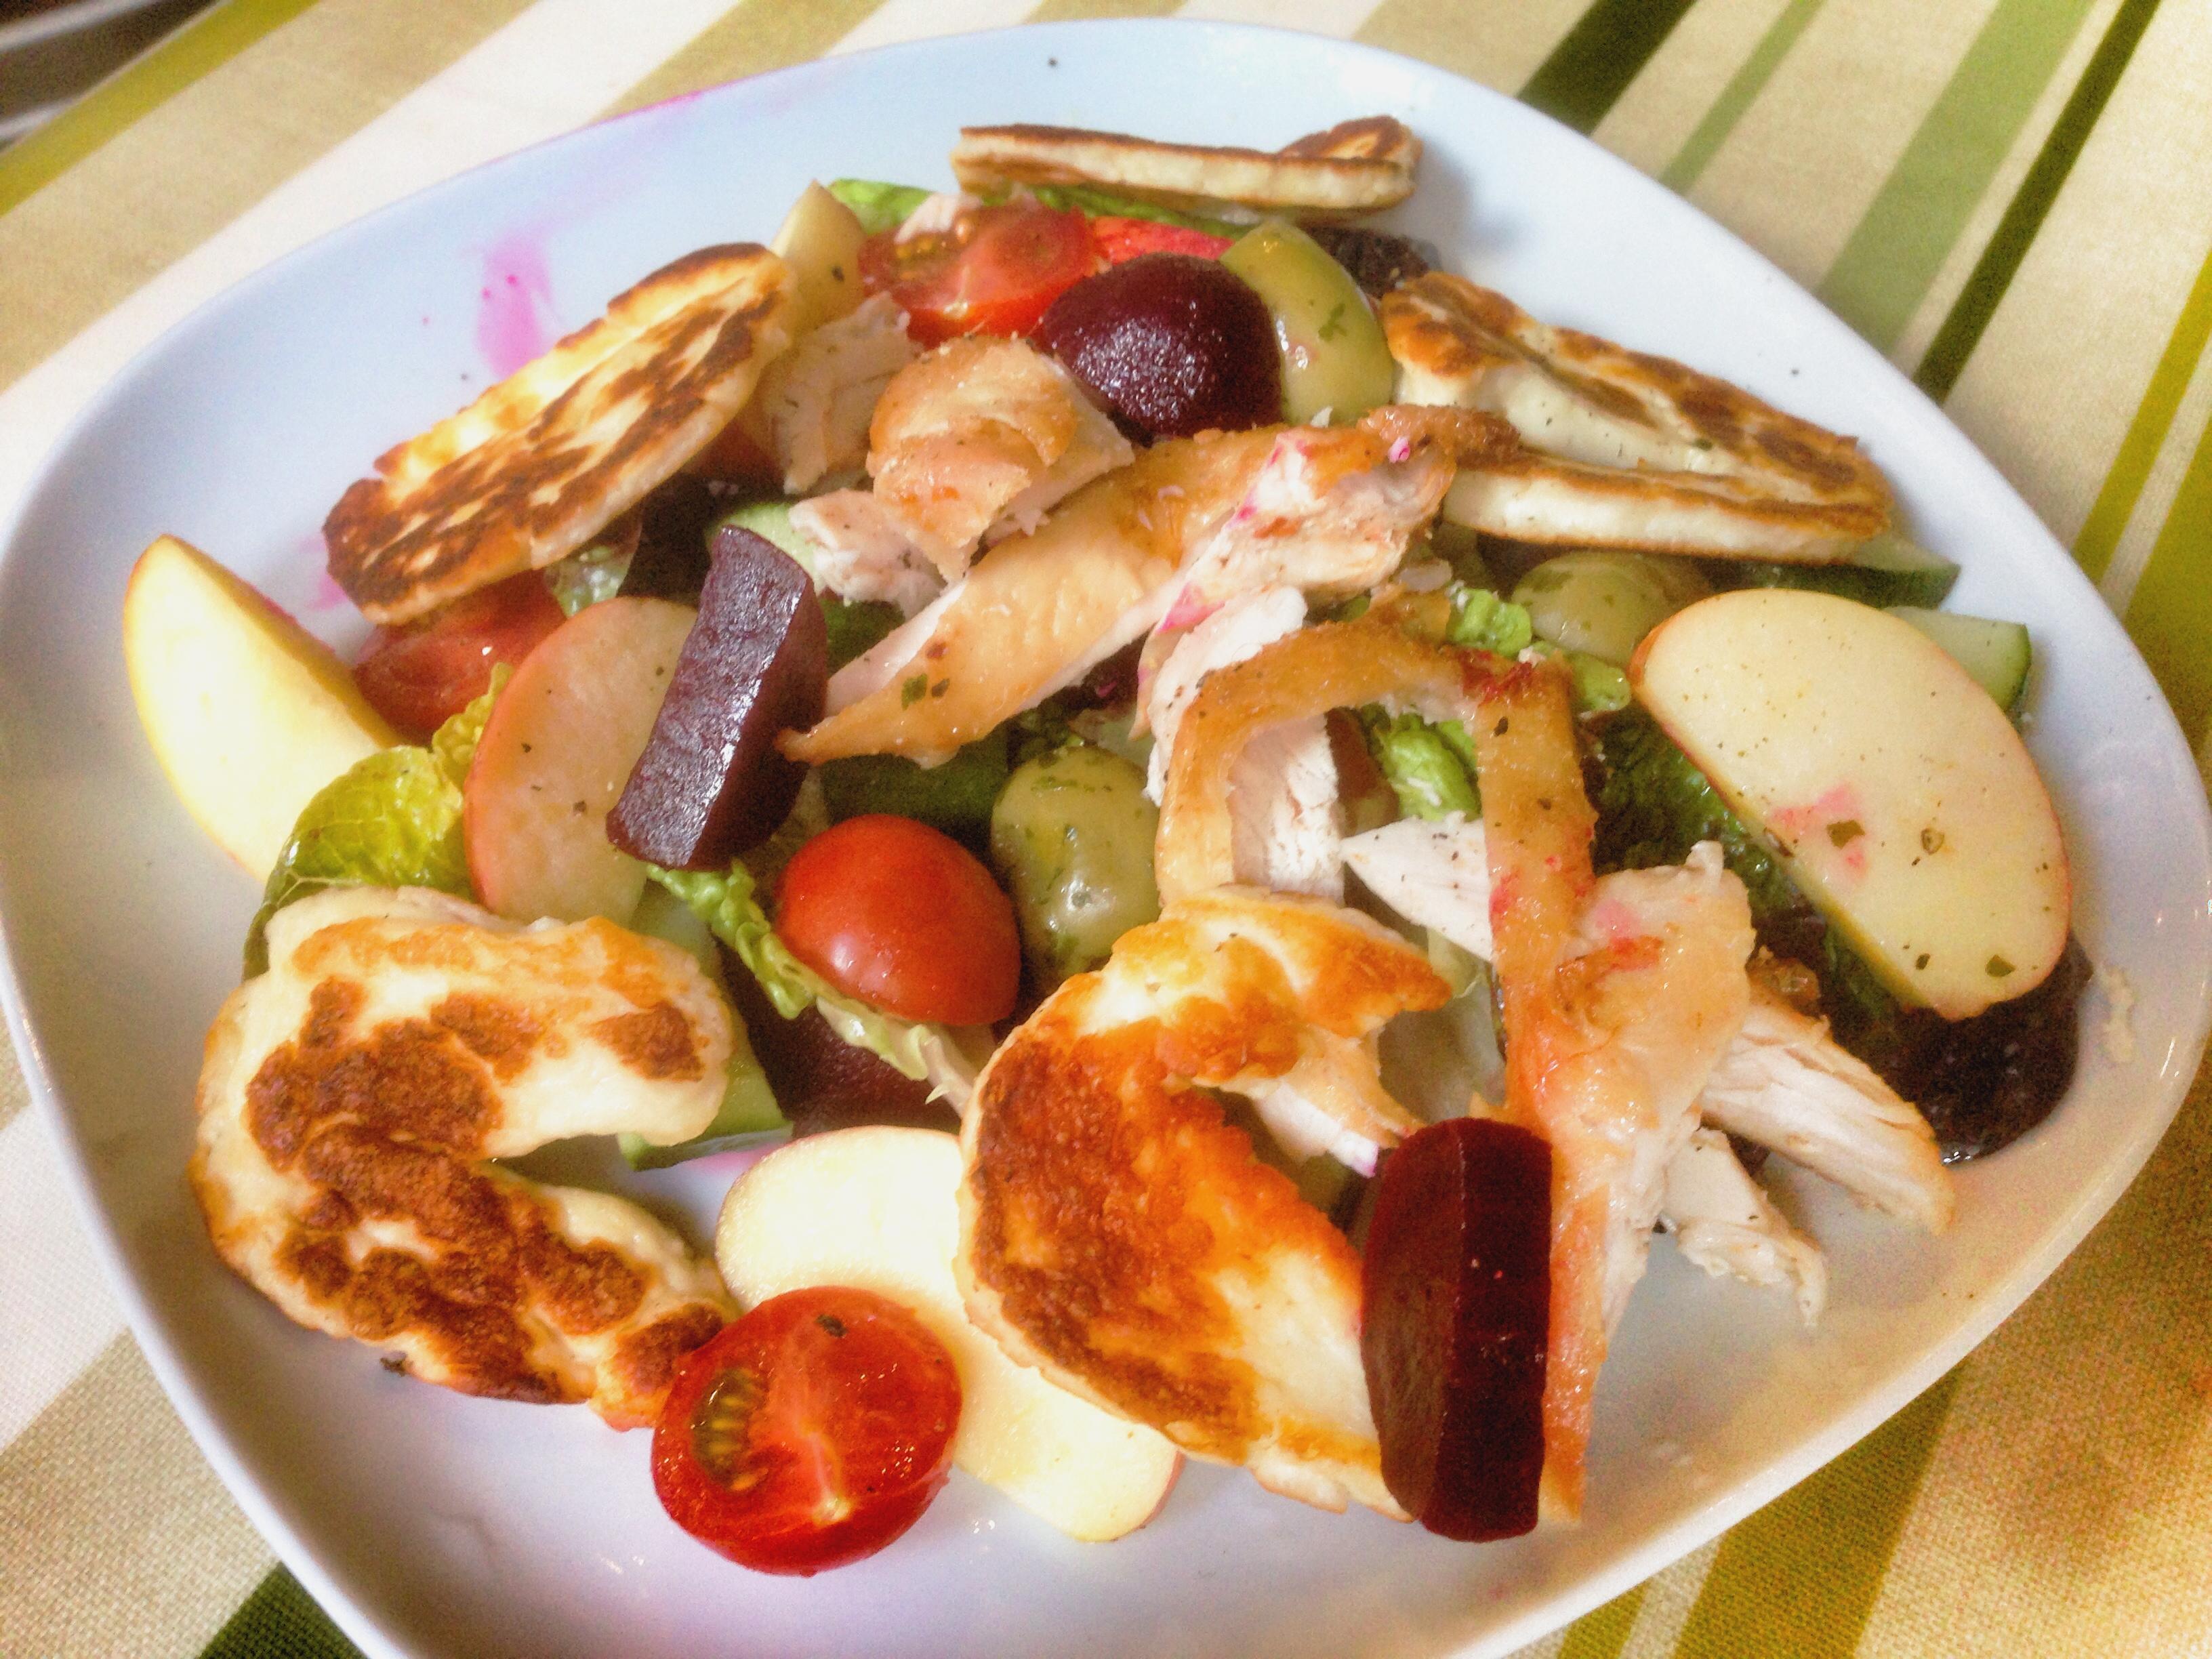 Chicken and halloumi salad